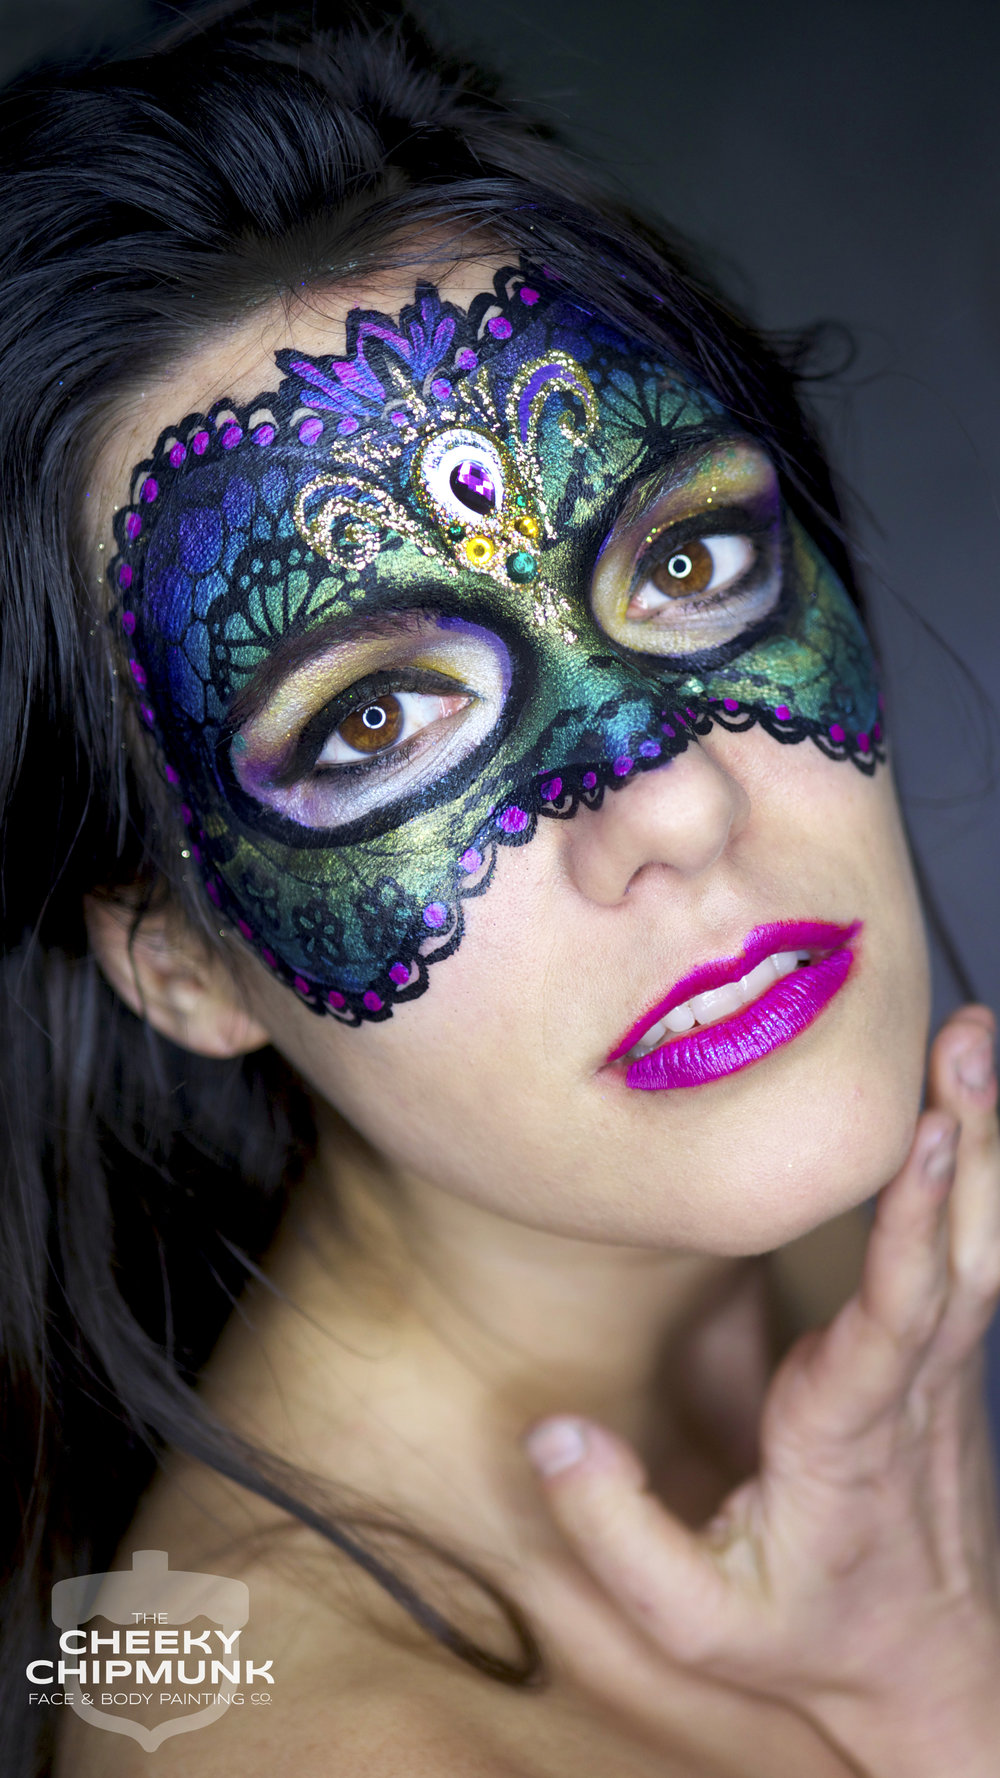 Jessica mardi gras lace mask.jpg